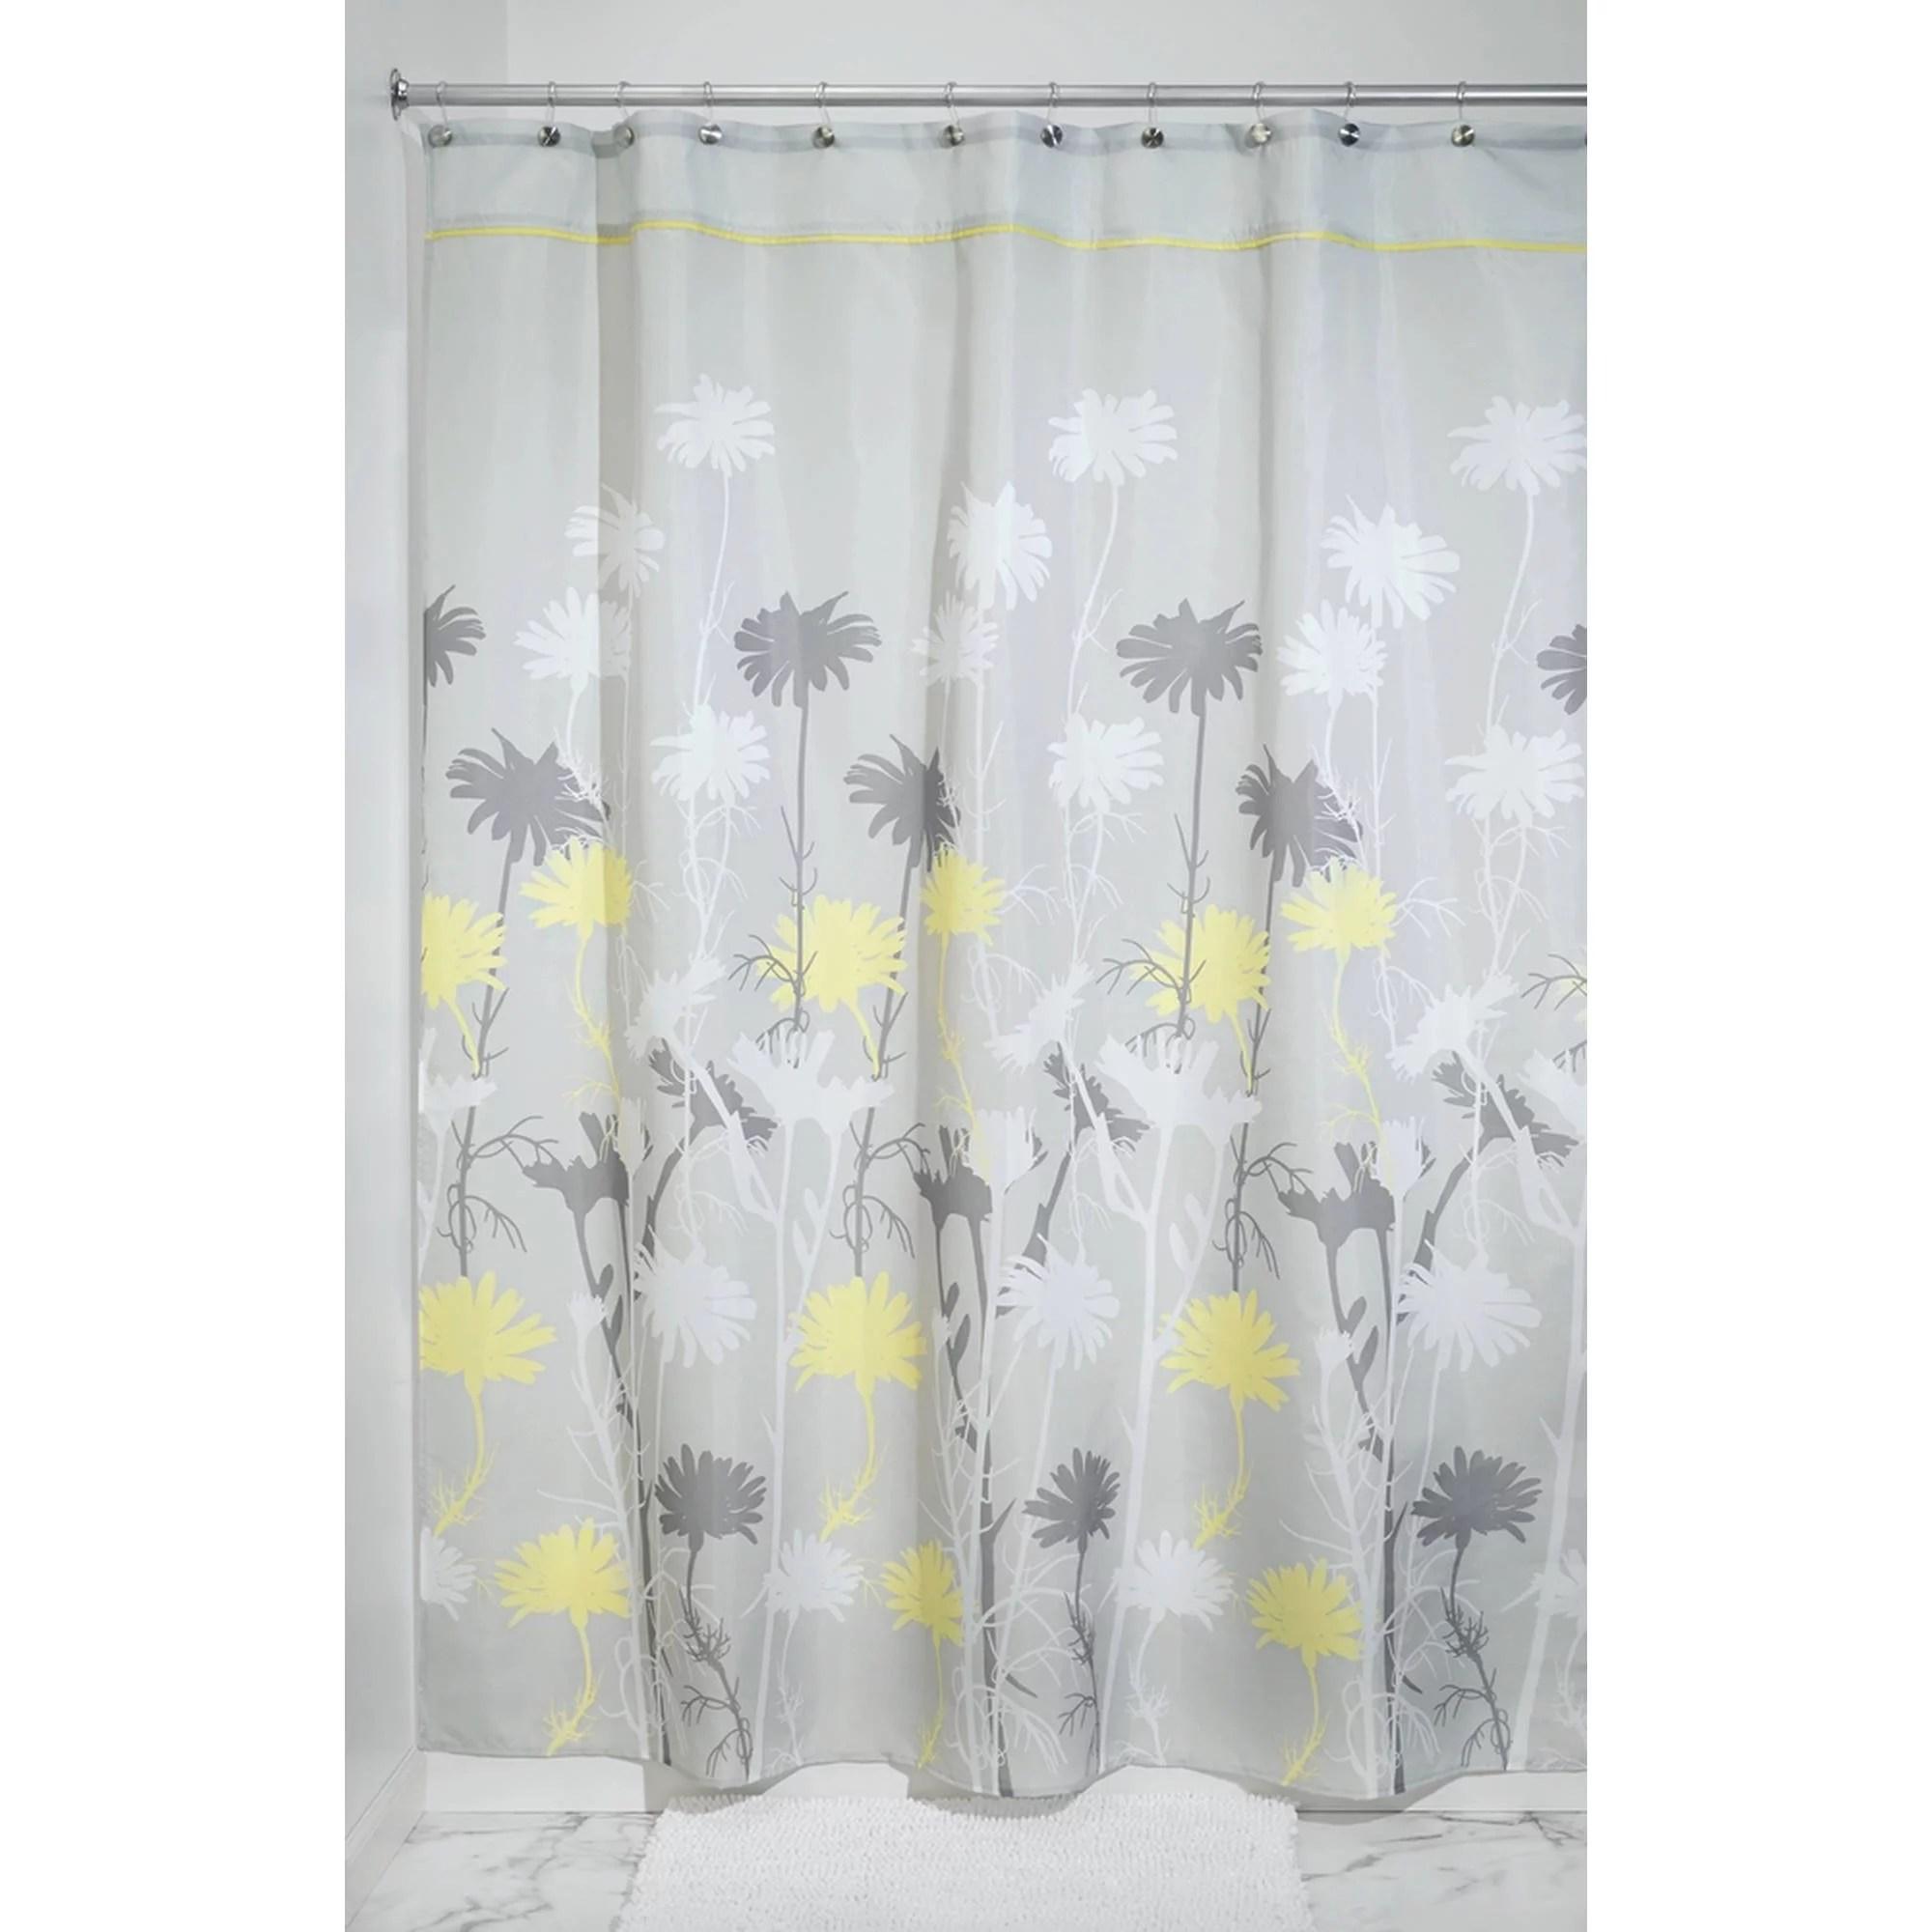 interdesign daizy fabric shower curtain stall 54 x 78 gray yellow